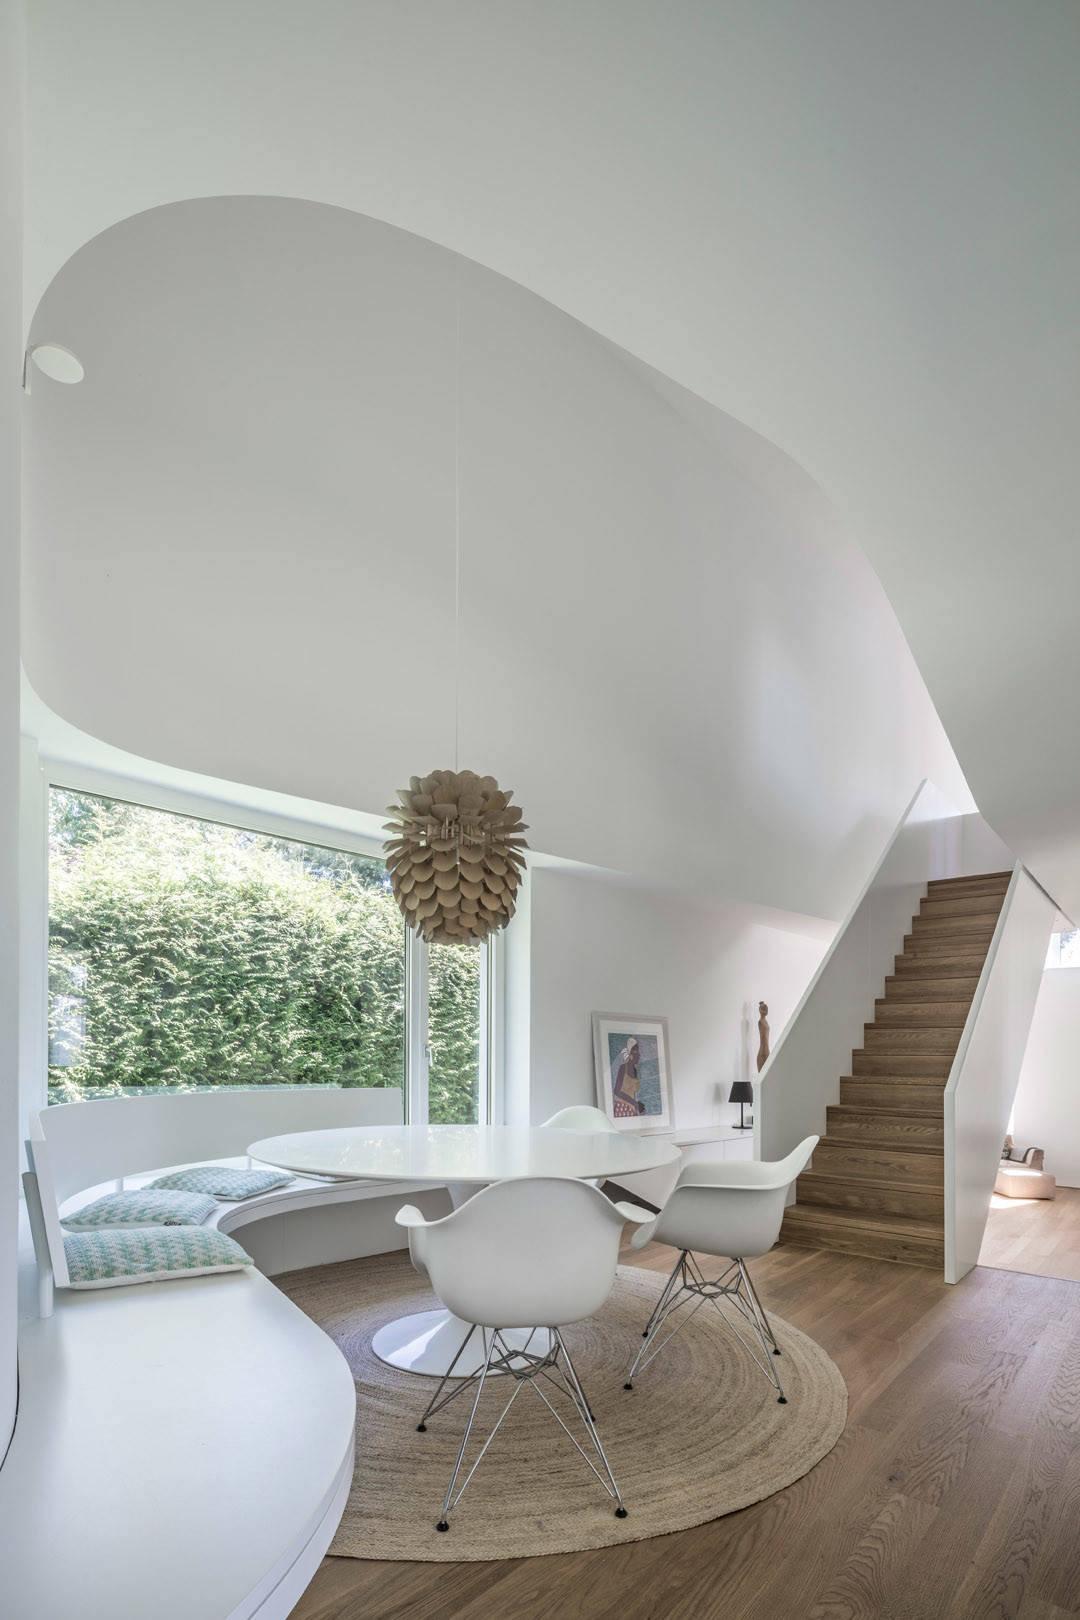 House in Dreieich by One Fine Day